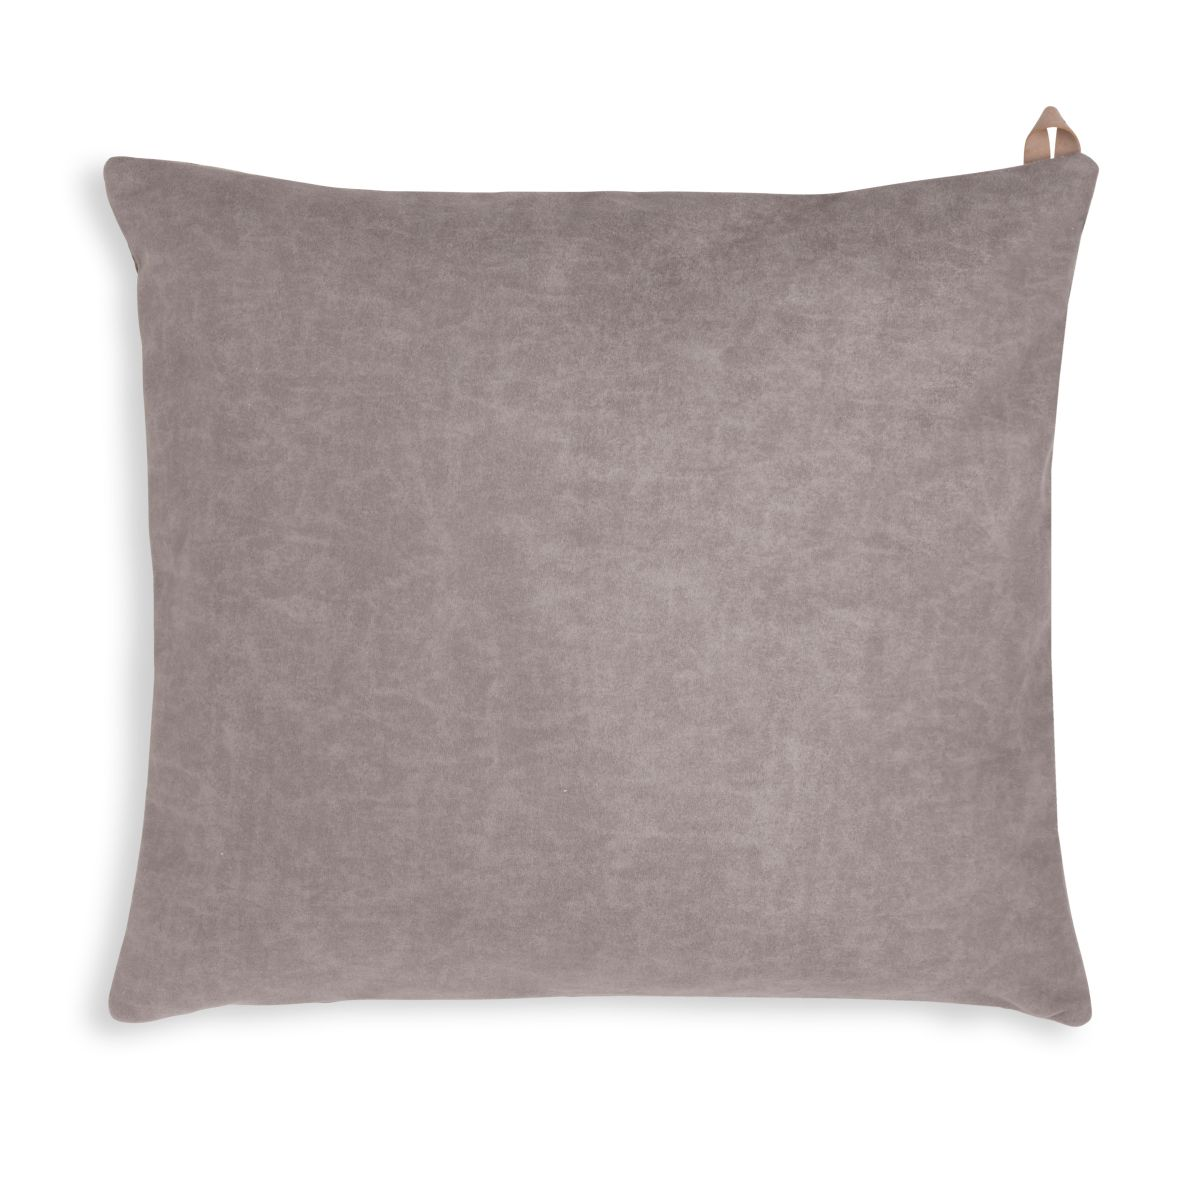 knit factory kf149012029 beau kussen taupe 50x50 2